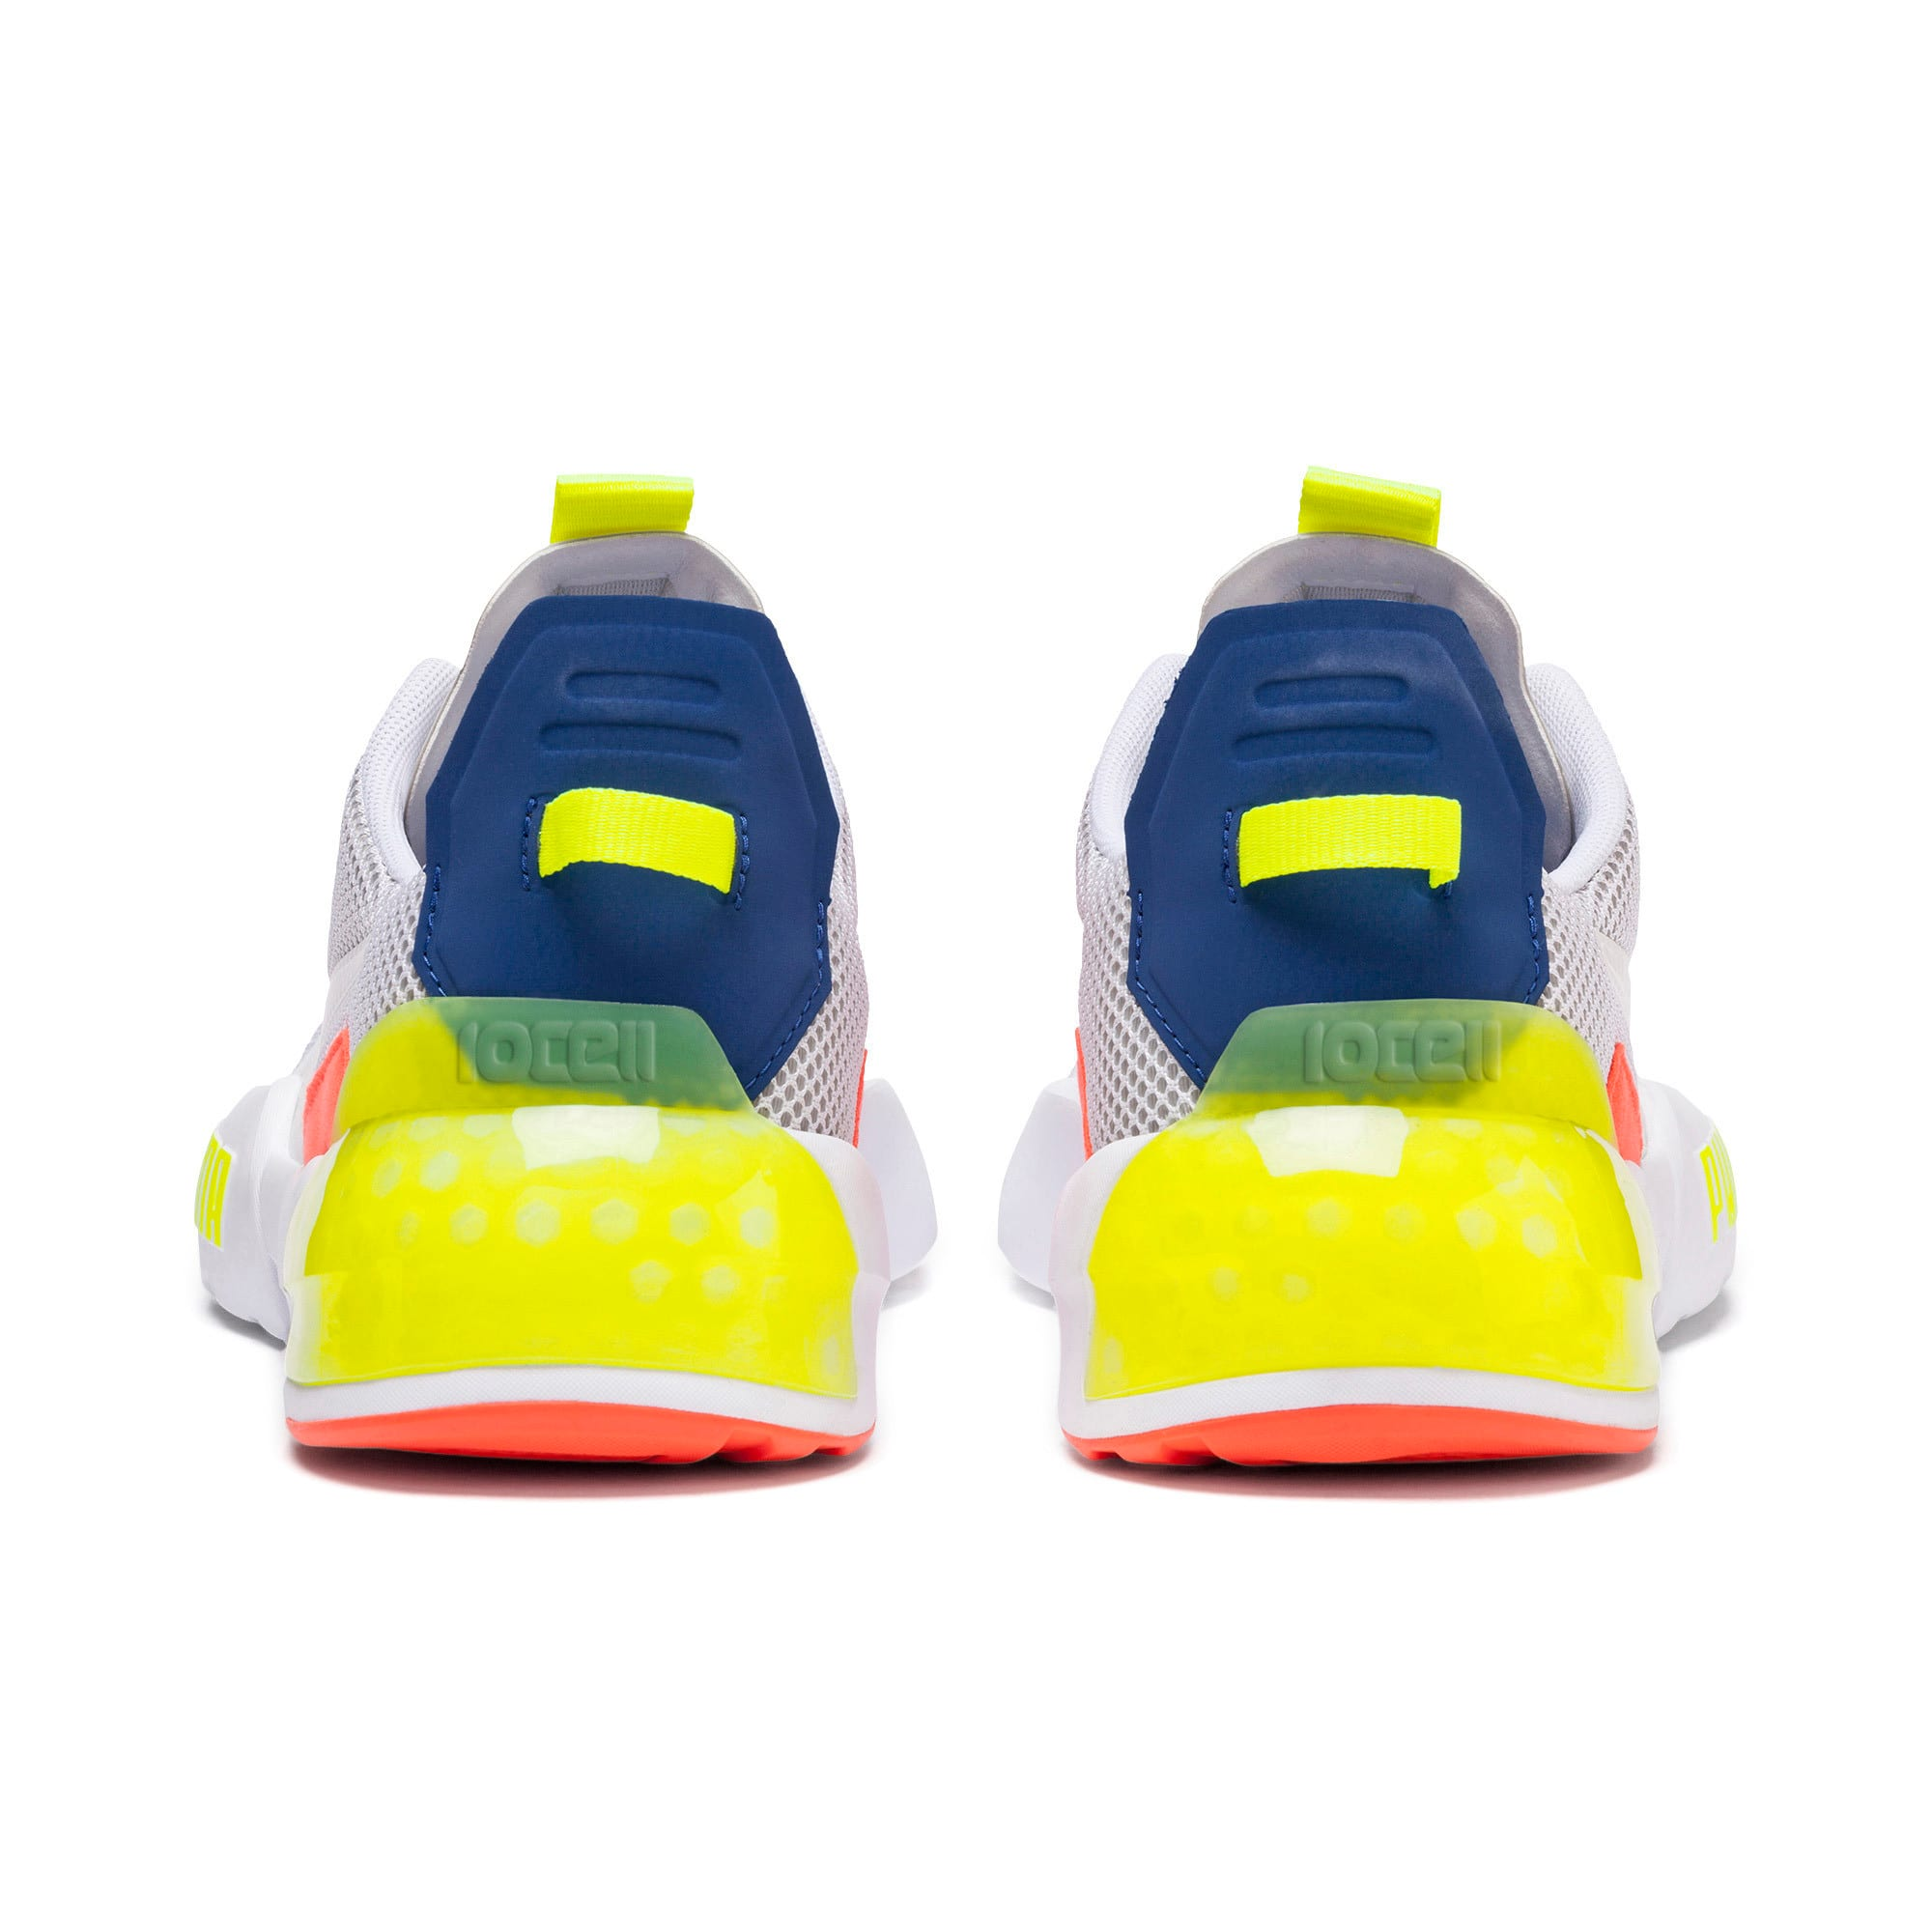 Thumbnail 5 of CELL Phase Men's Training Shoes, White-GalaxyBlue-YellowAlert, medium